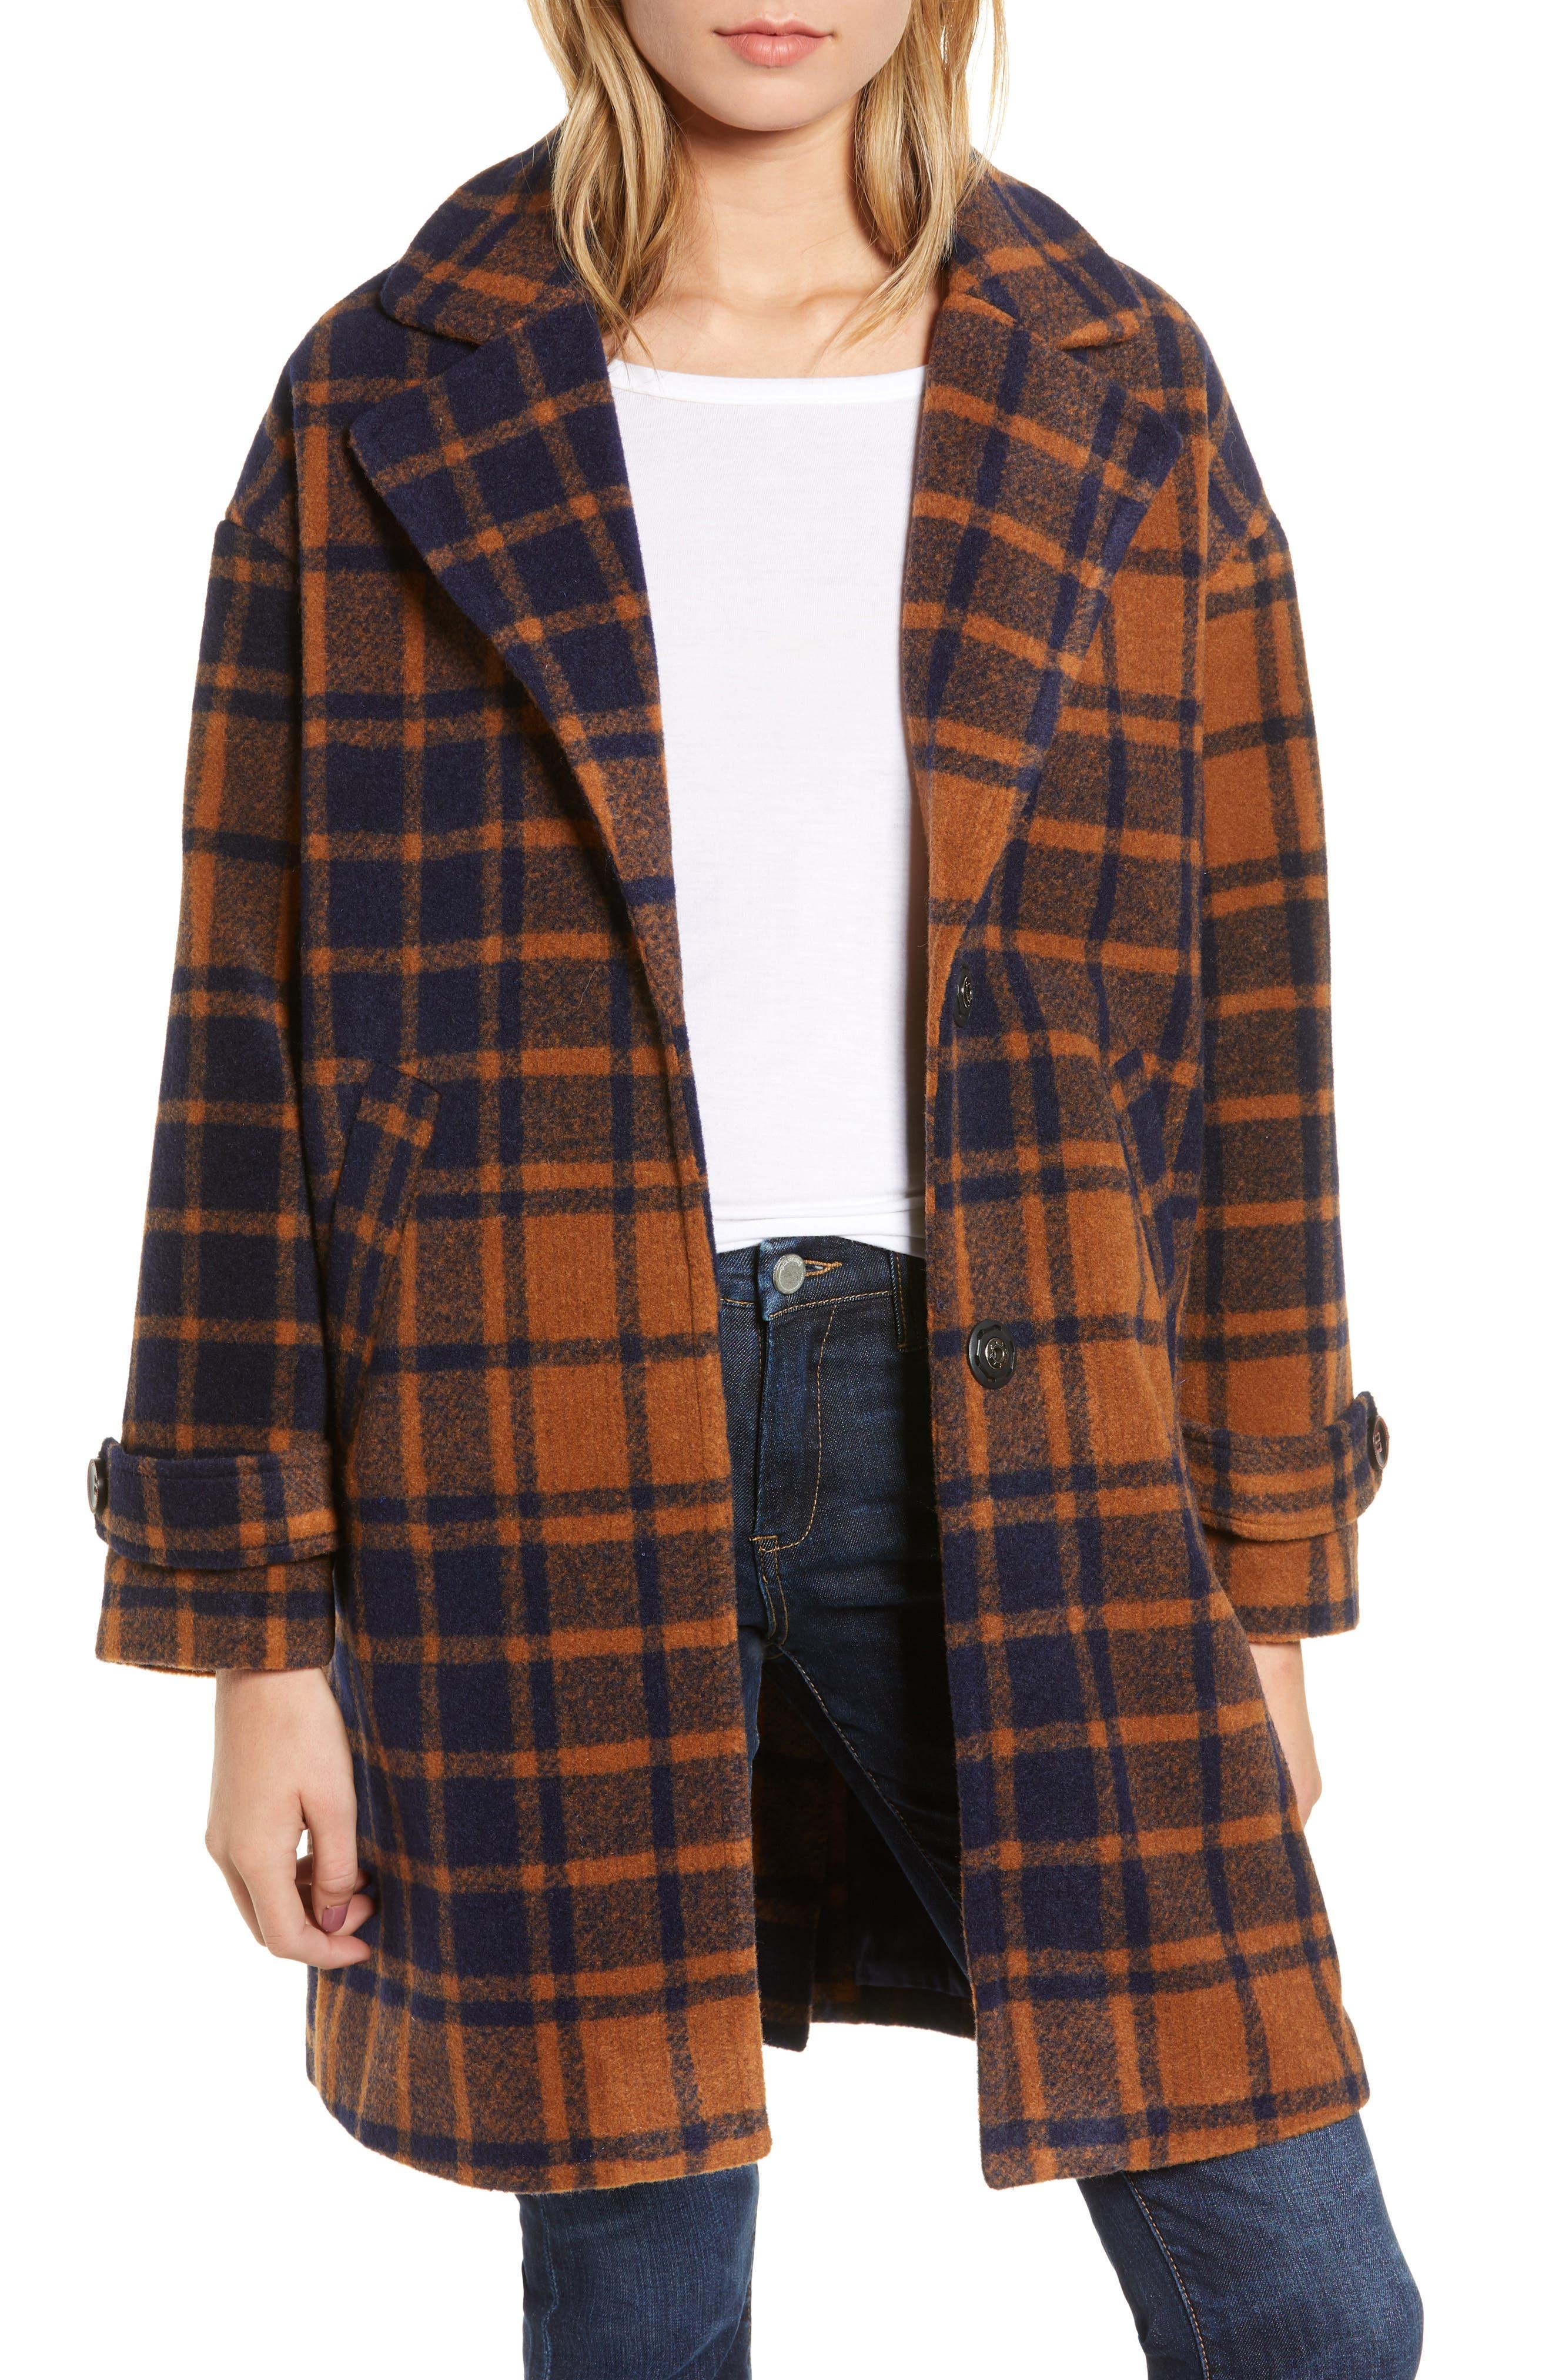 HEARTLOOM Kai Long Coat in Dijon